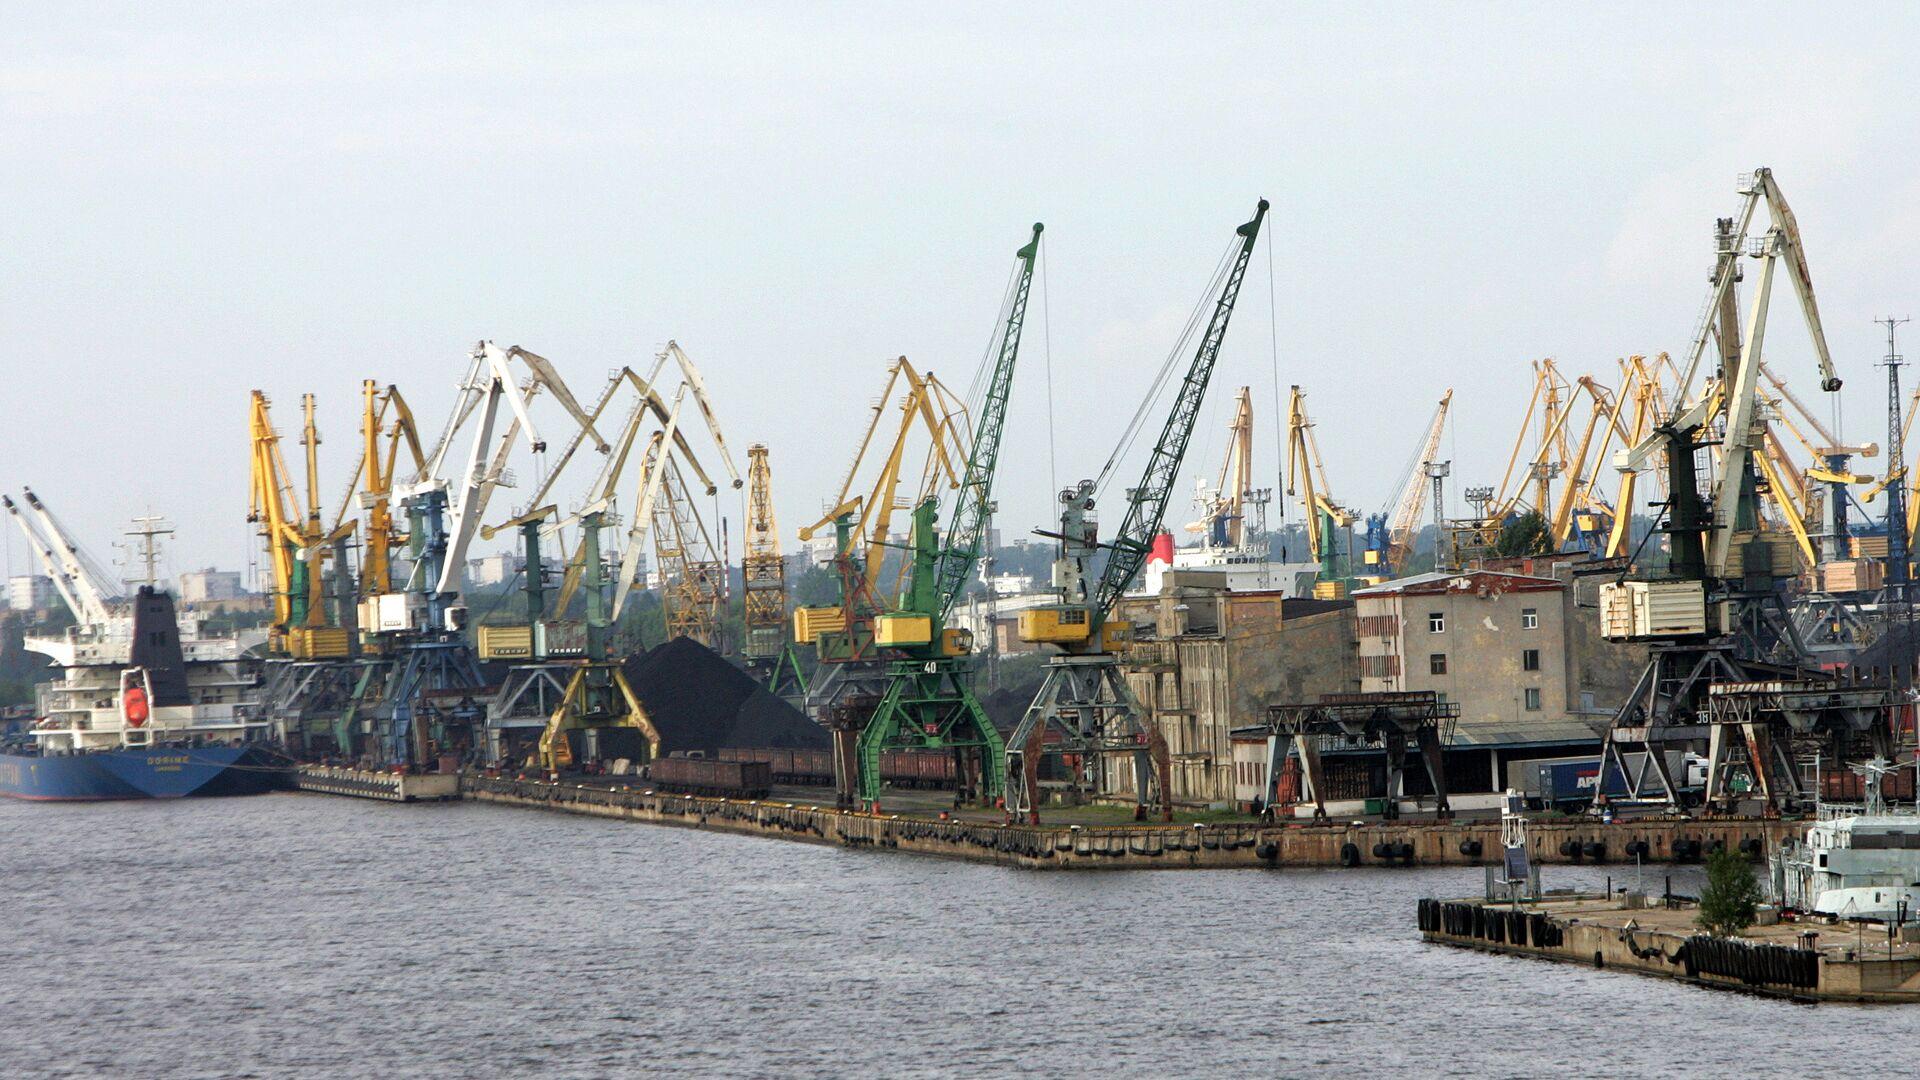 Порт в Риге - Sputnik Latvija, 1920, 01.04.2021